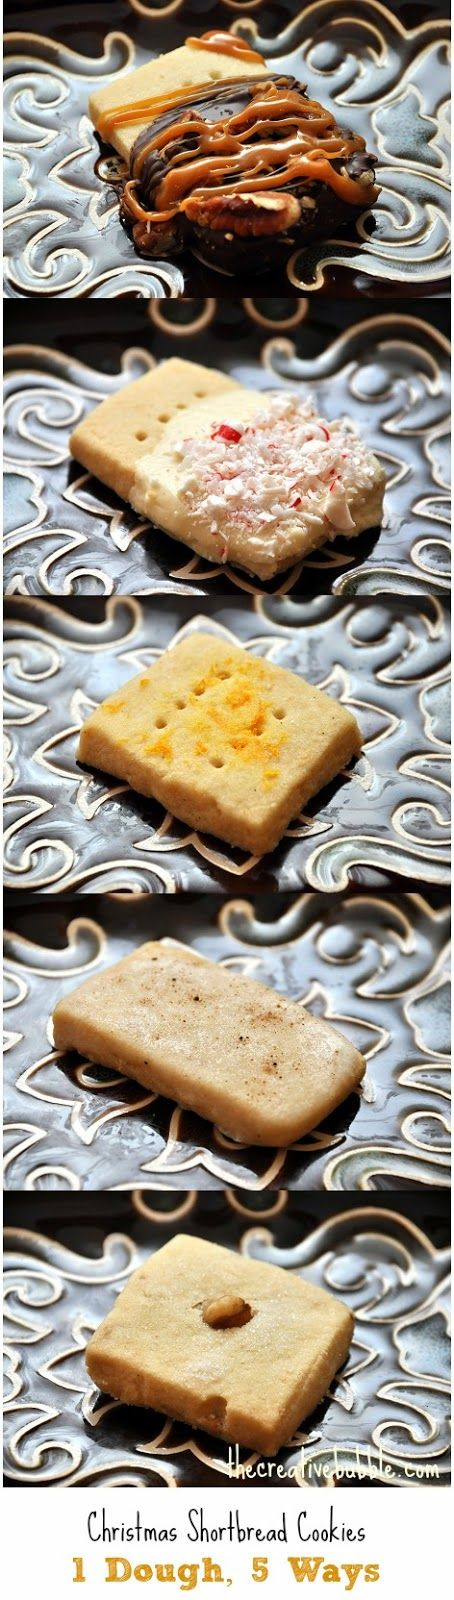 Shortbread Cookies, 1 Dough, 5 Ways: Salty Turtle, White Chocolate ...